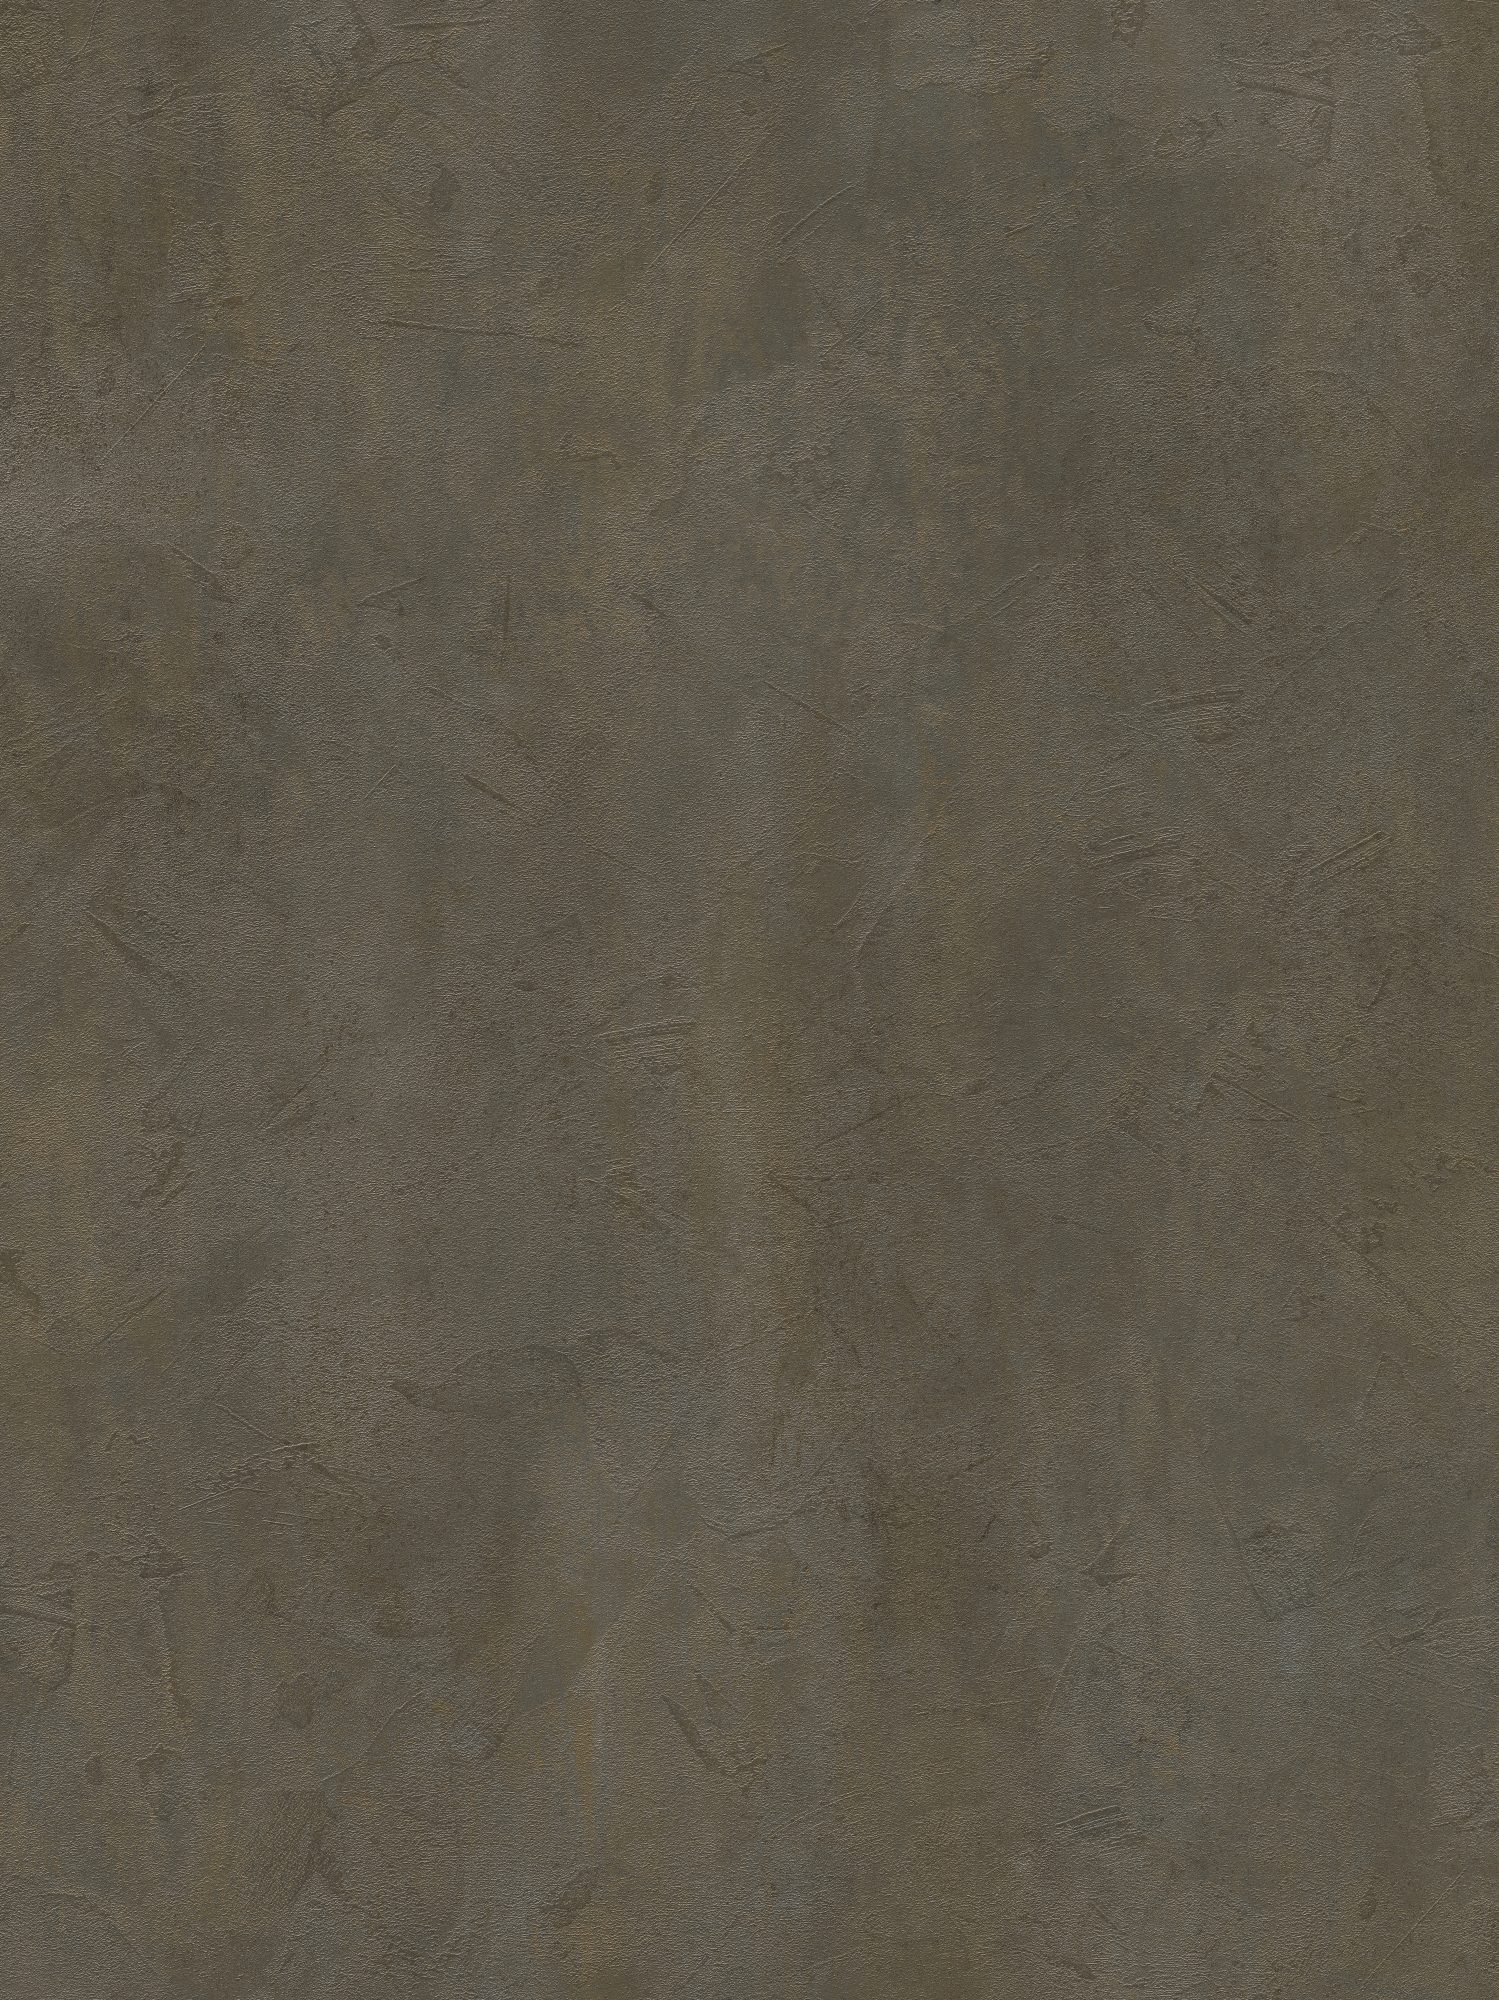 DecoLegno CLEAF, FB47 Ares, detail afbeelding